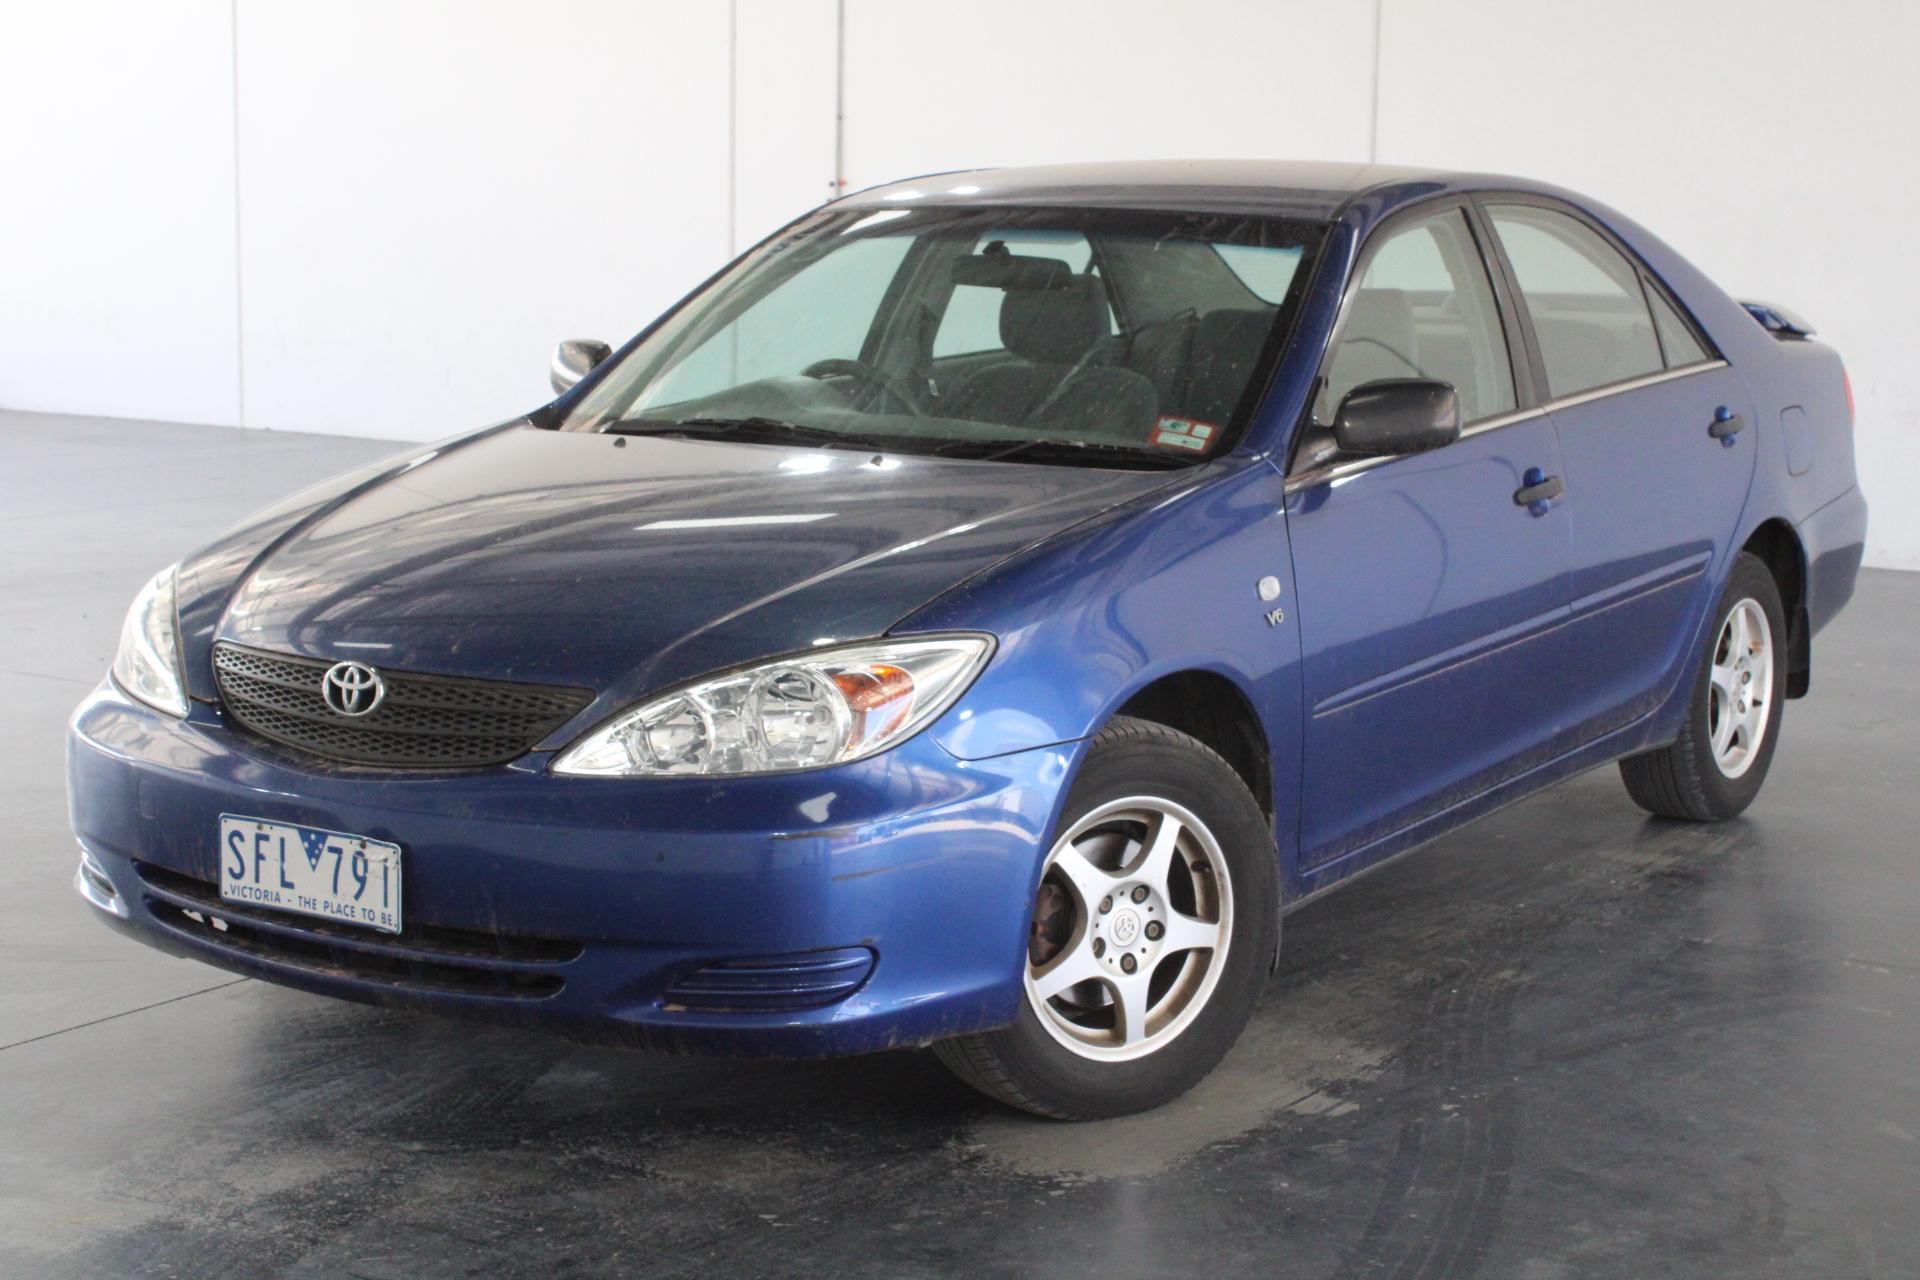 2003 Toyota Camry Altise MCV36R Automatic Sedan